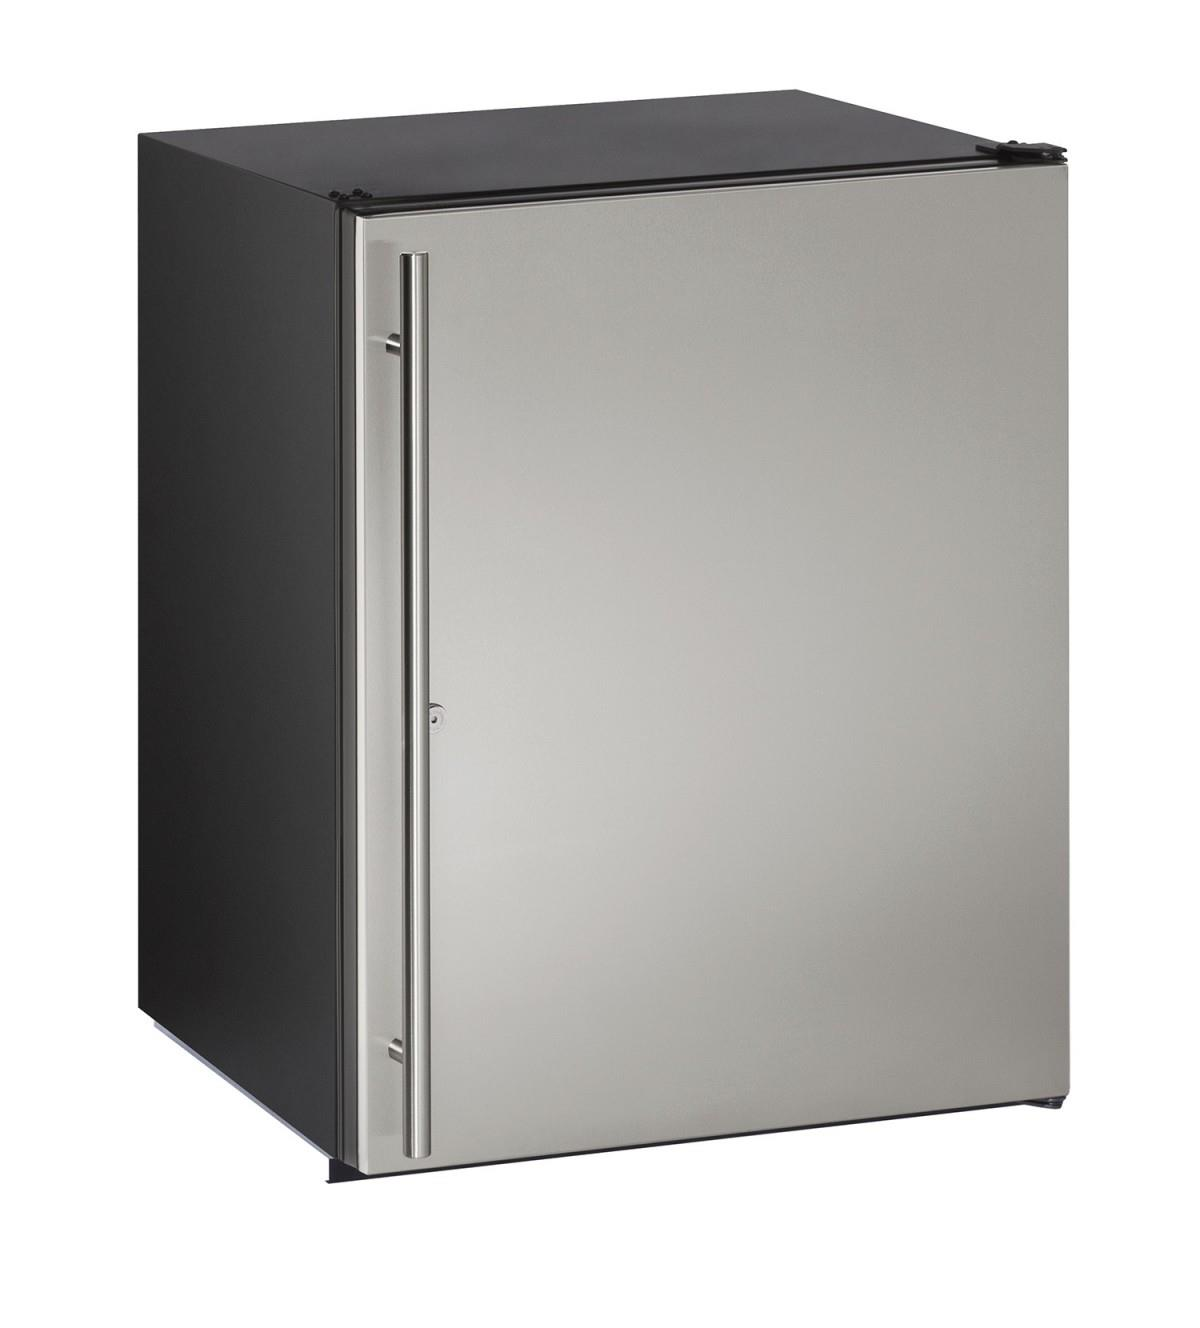 U-Line Refrigerators 5.3 cu. ft. Under-Counter Refrigerator - Item Number: U-ADA24RS-13A